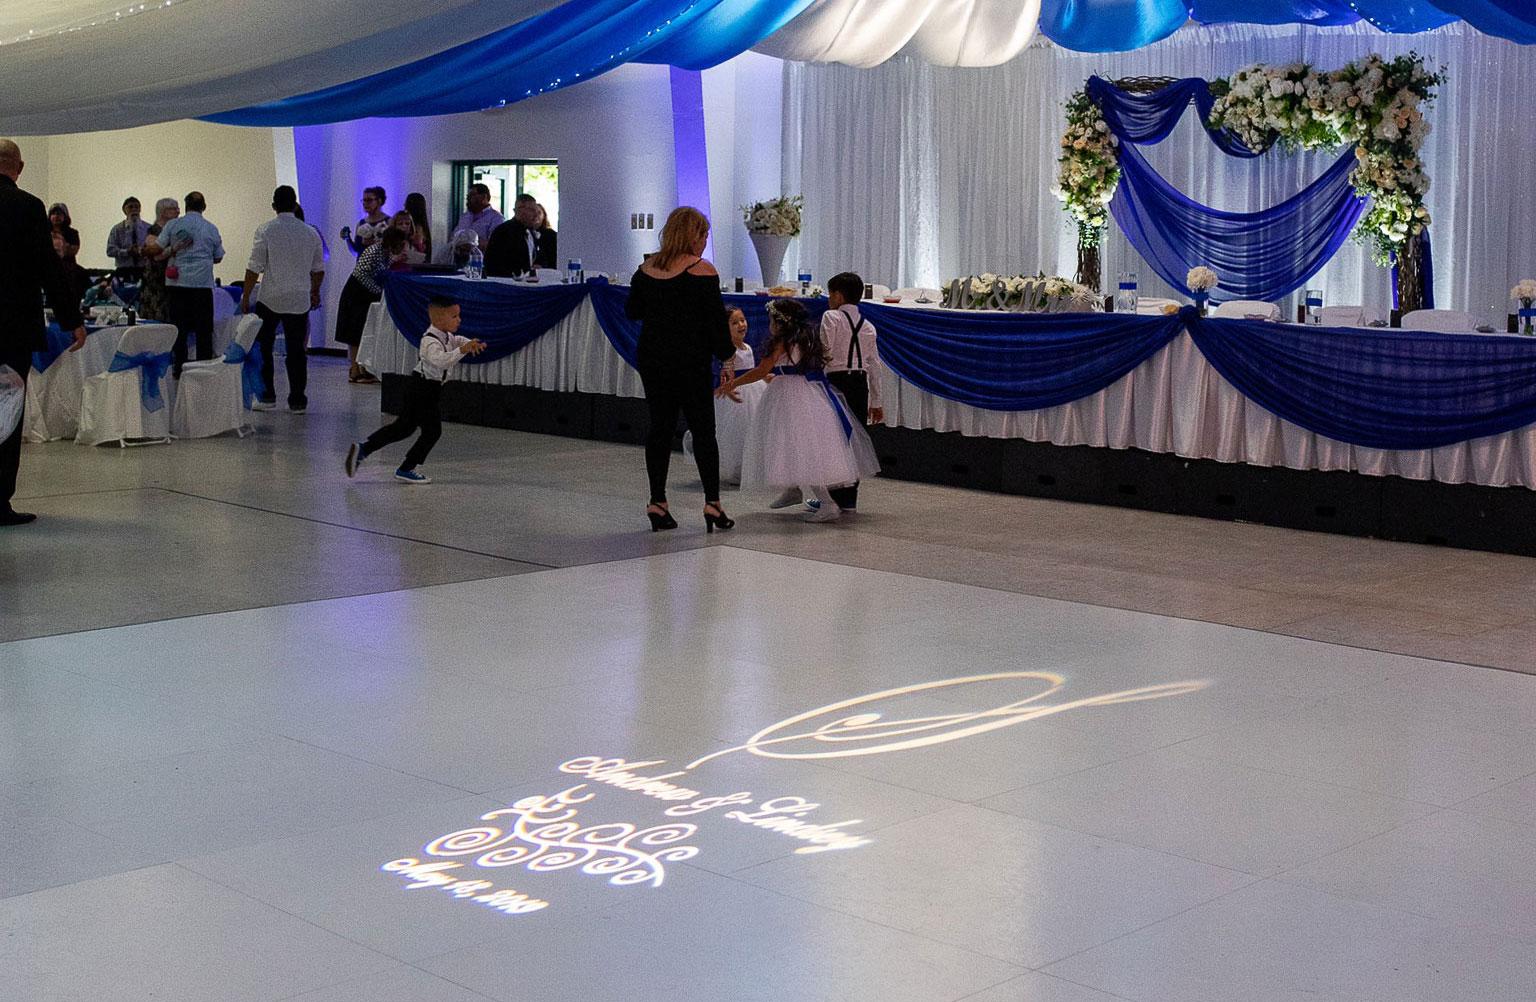 Special Event Rental and dance floor